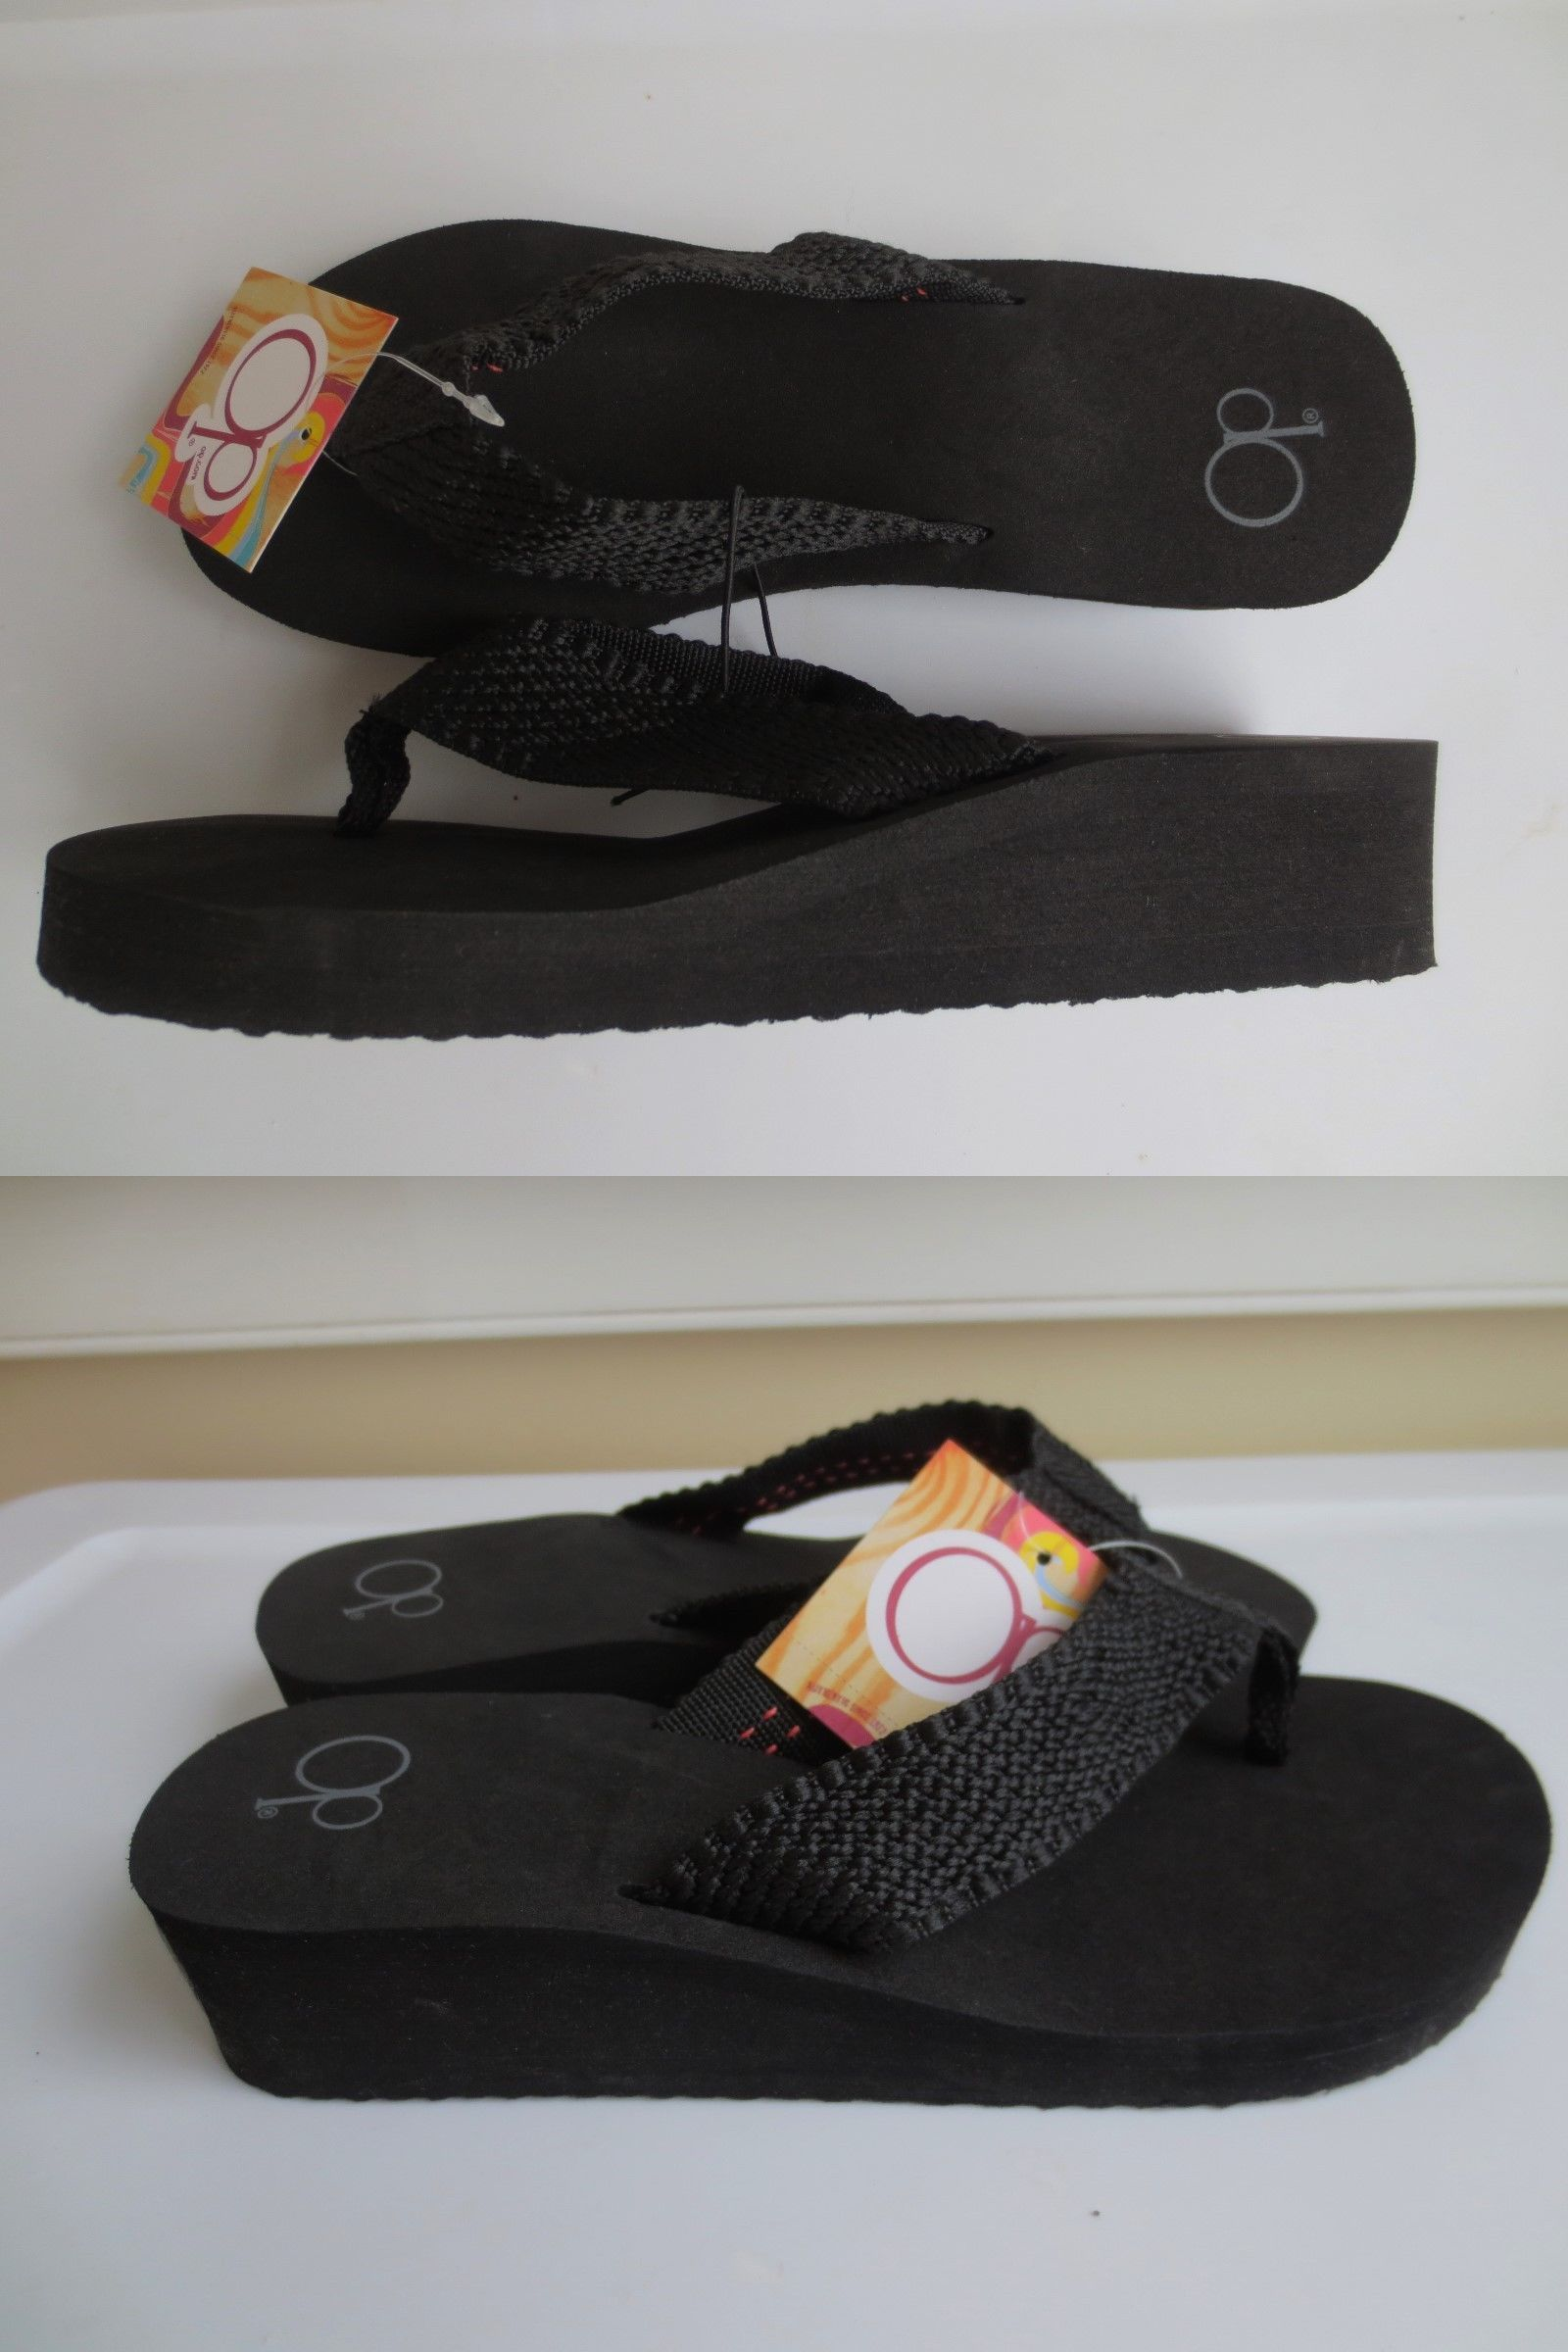 506795414e4 Sandals 62107  New Women  Large 9-10  Or  Xl 11-12  Op Yoga Mat Black Wedge Flip  Flops Sandals -  BUY IT NOW ONLY   14.99 on  eBay  sandals  women  black ...